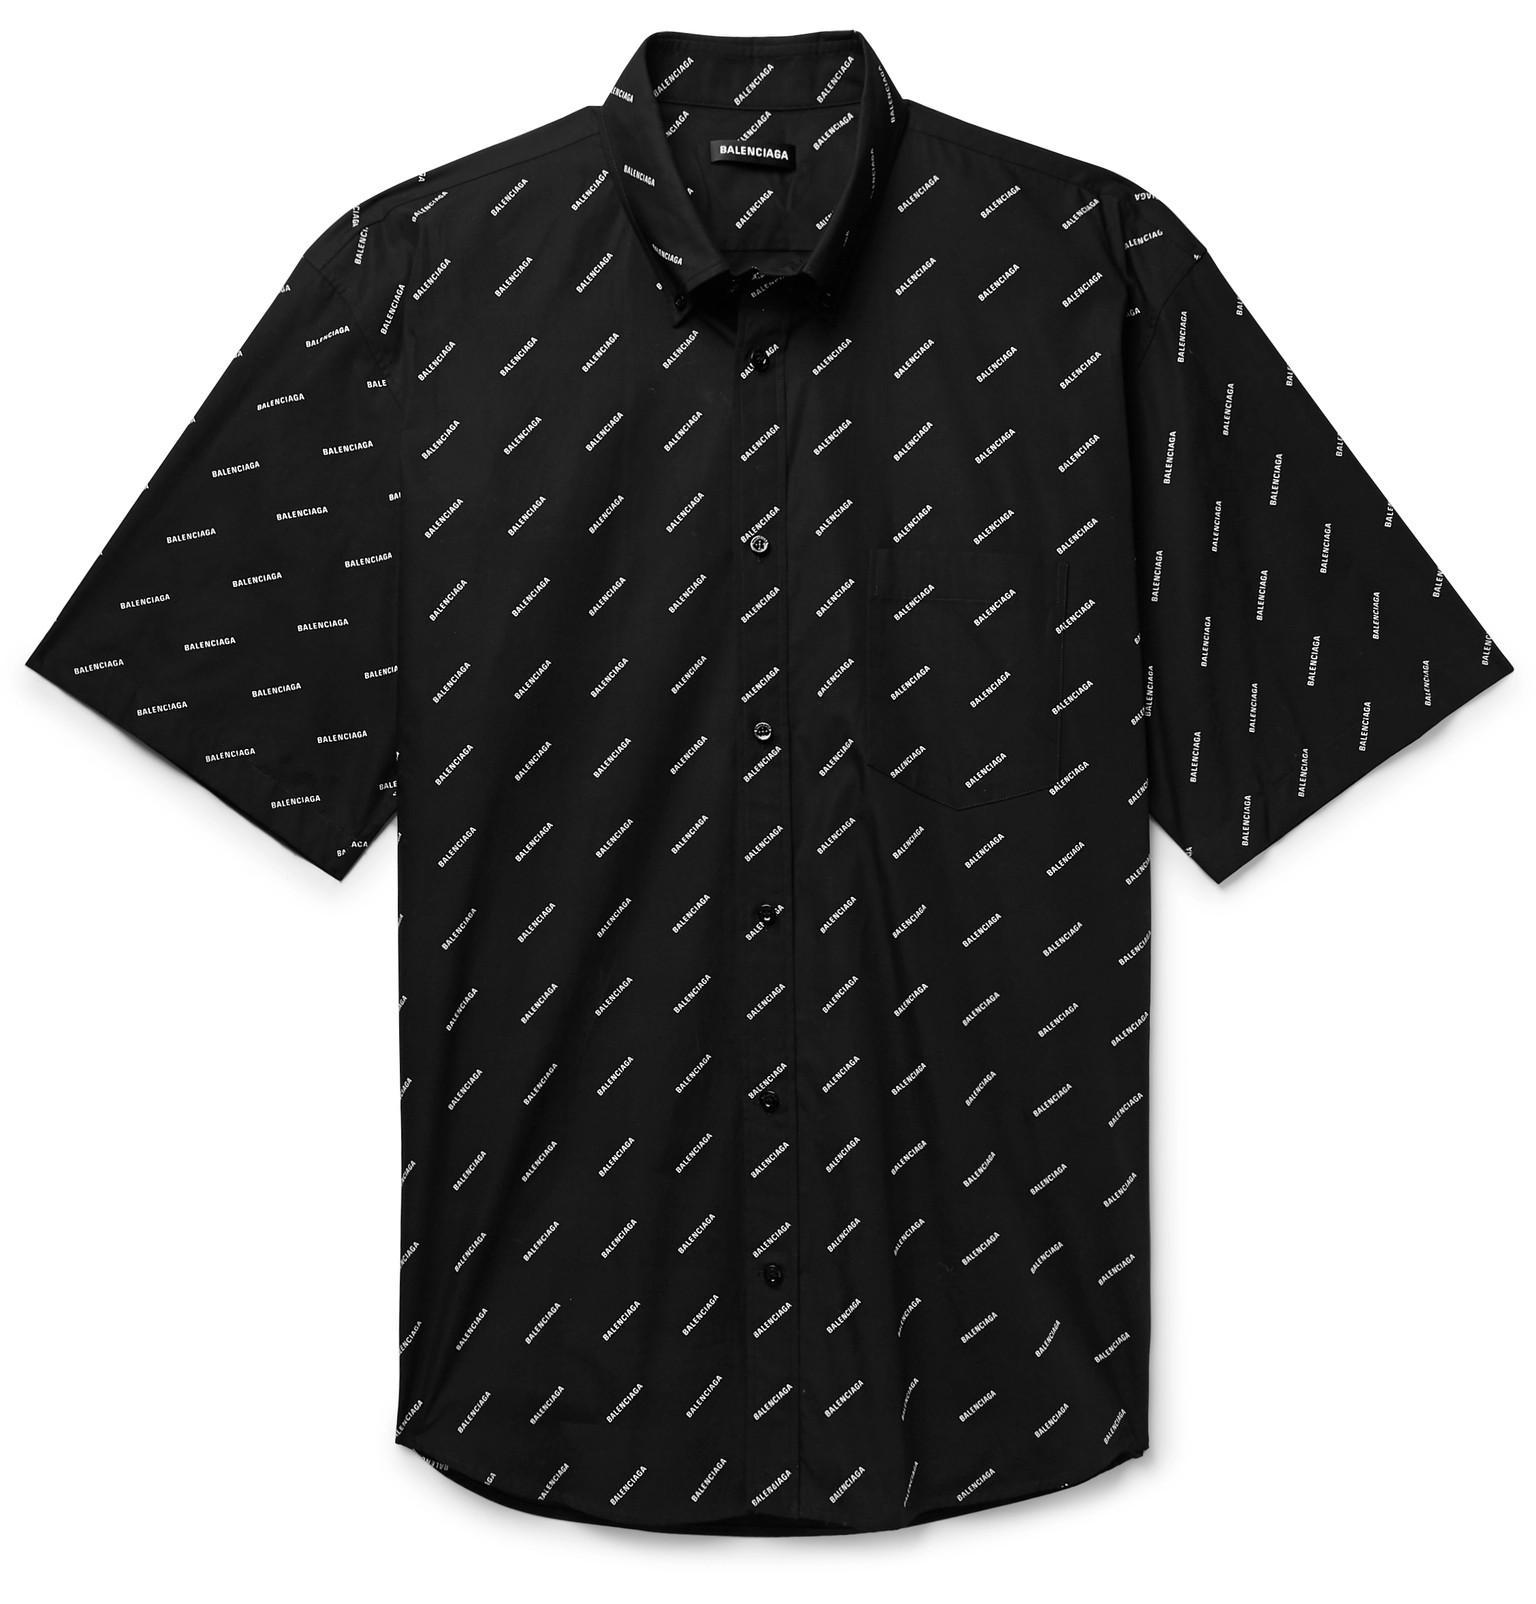 d1a9ae7b45a Lyst - Balenciaga Black And White Logo Normal Fit Shirt in Black for ...